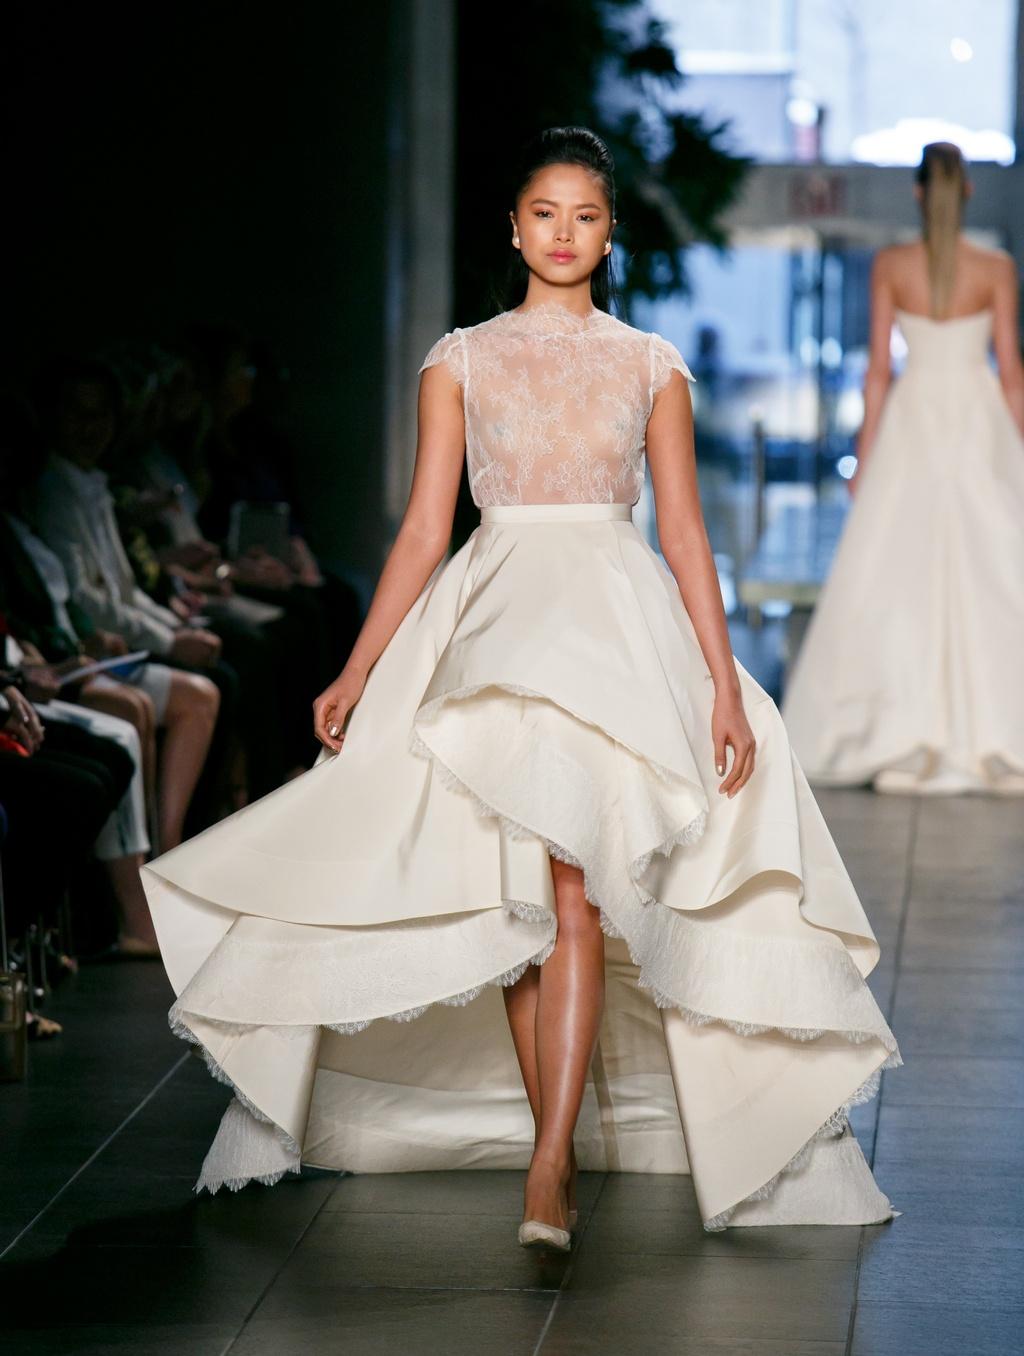 Daring-wedding-dress-by-rivini.full